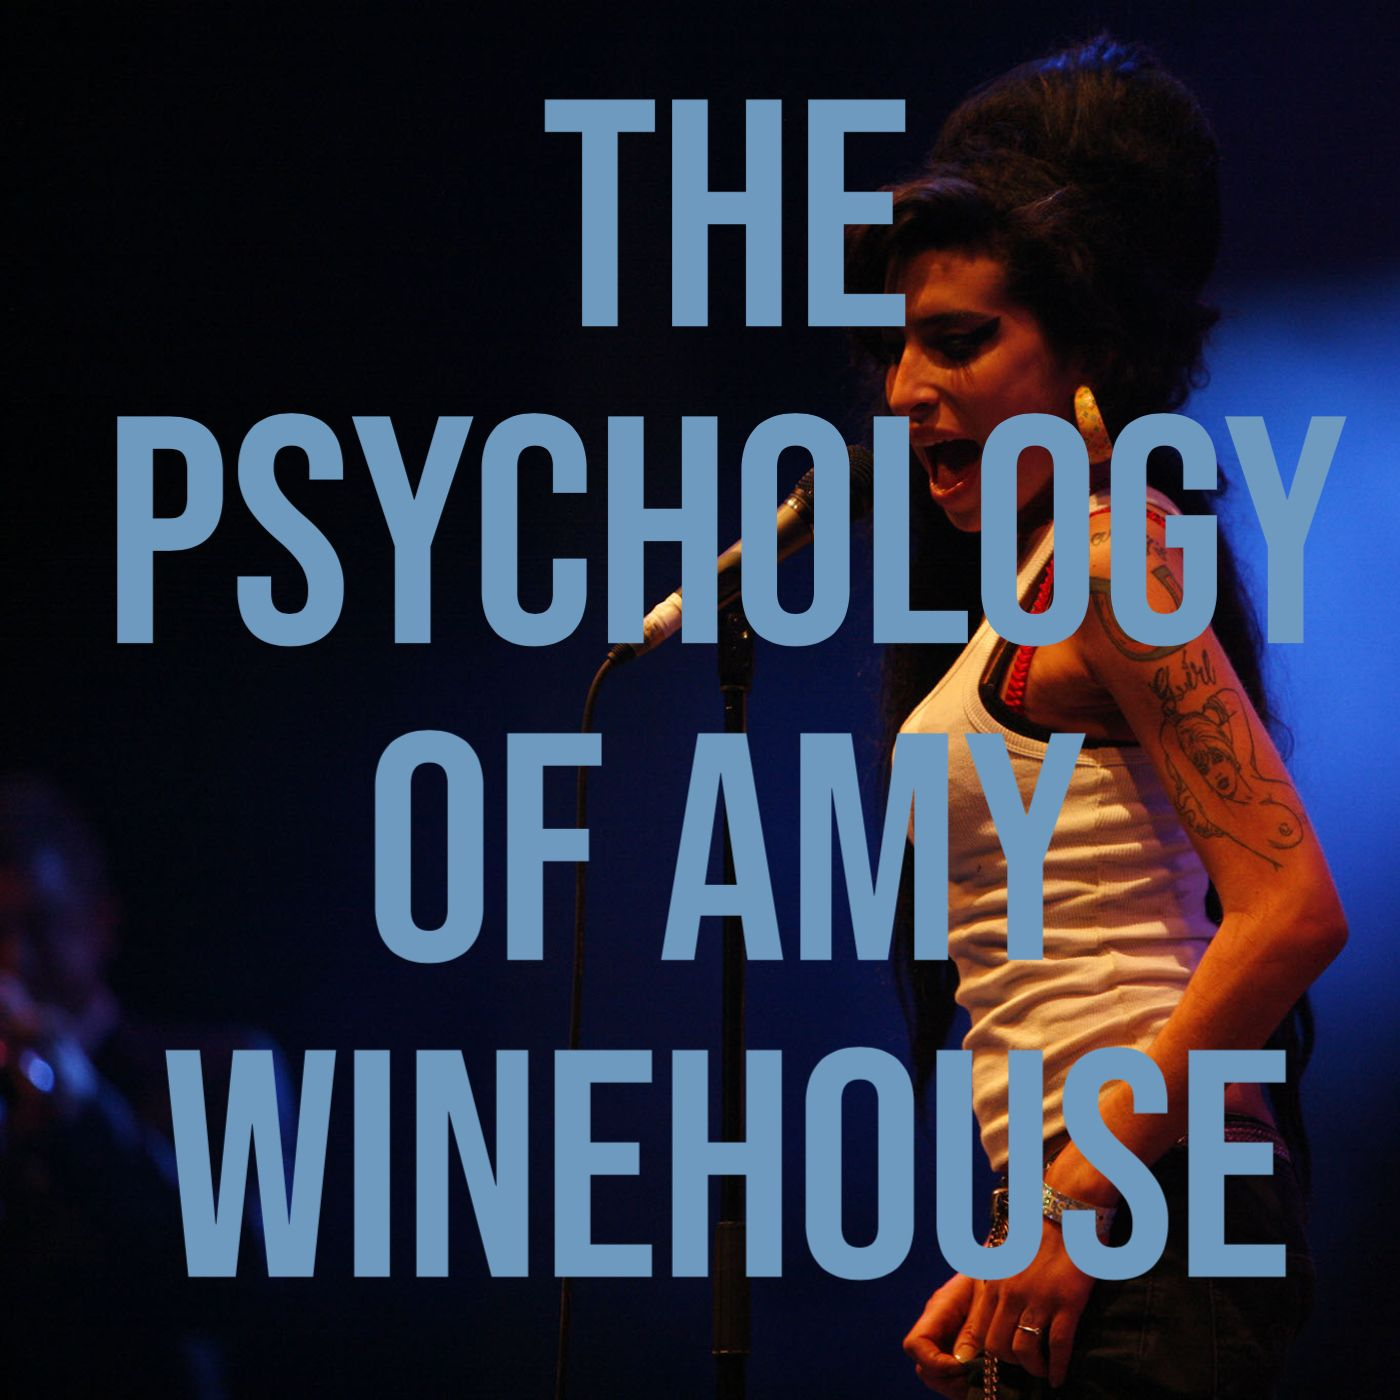 The Psychology of Amy Winehouse (2015 Rerun)